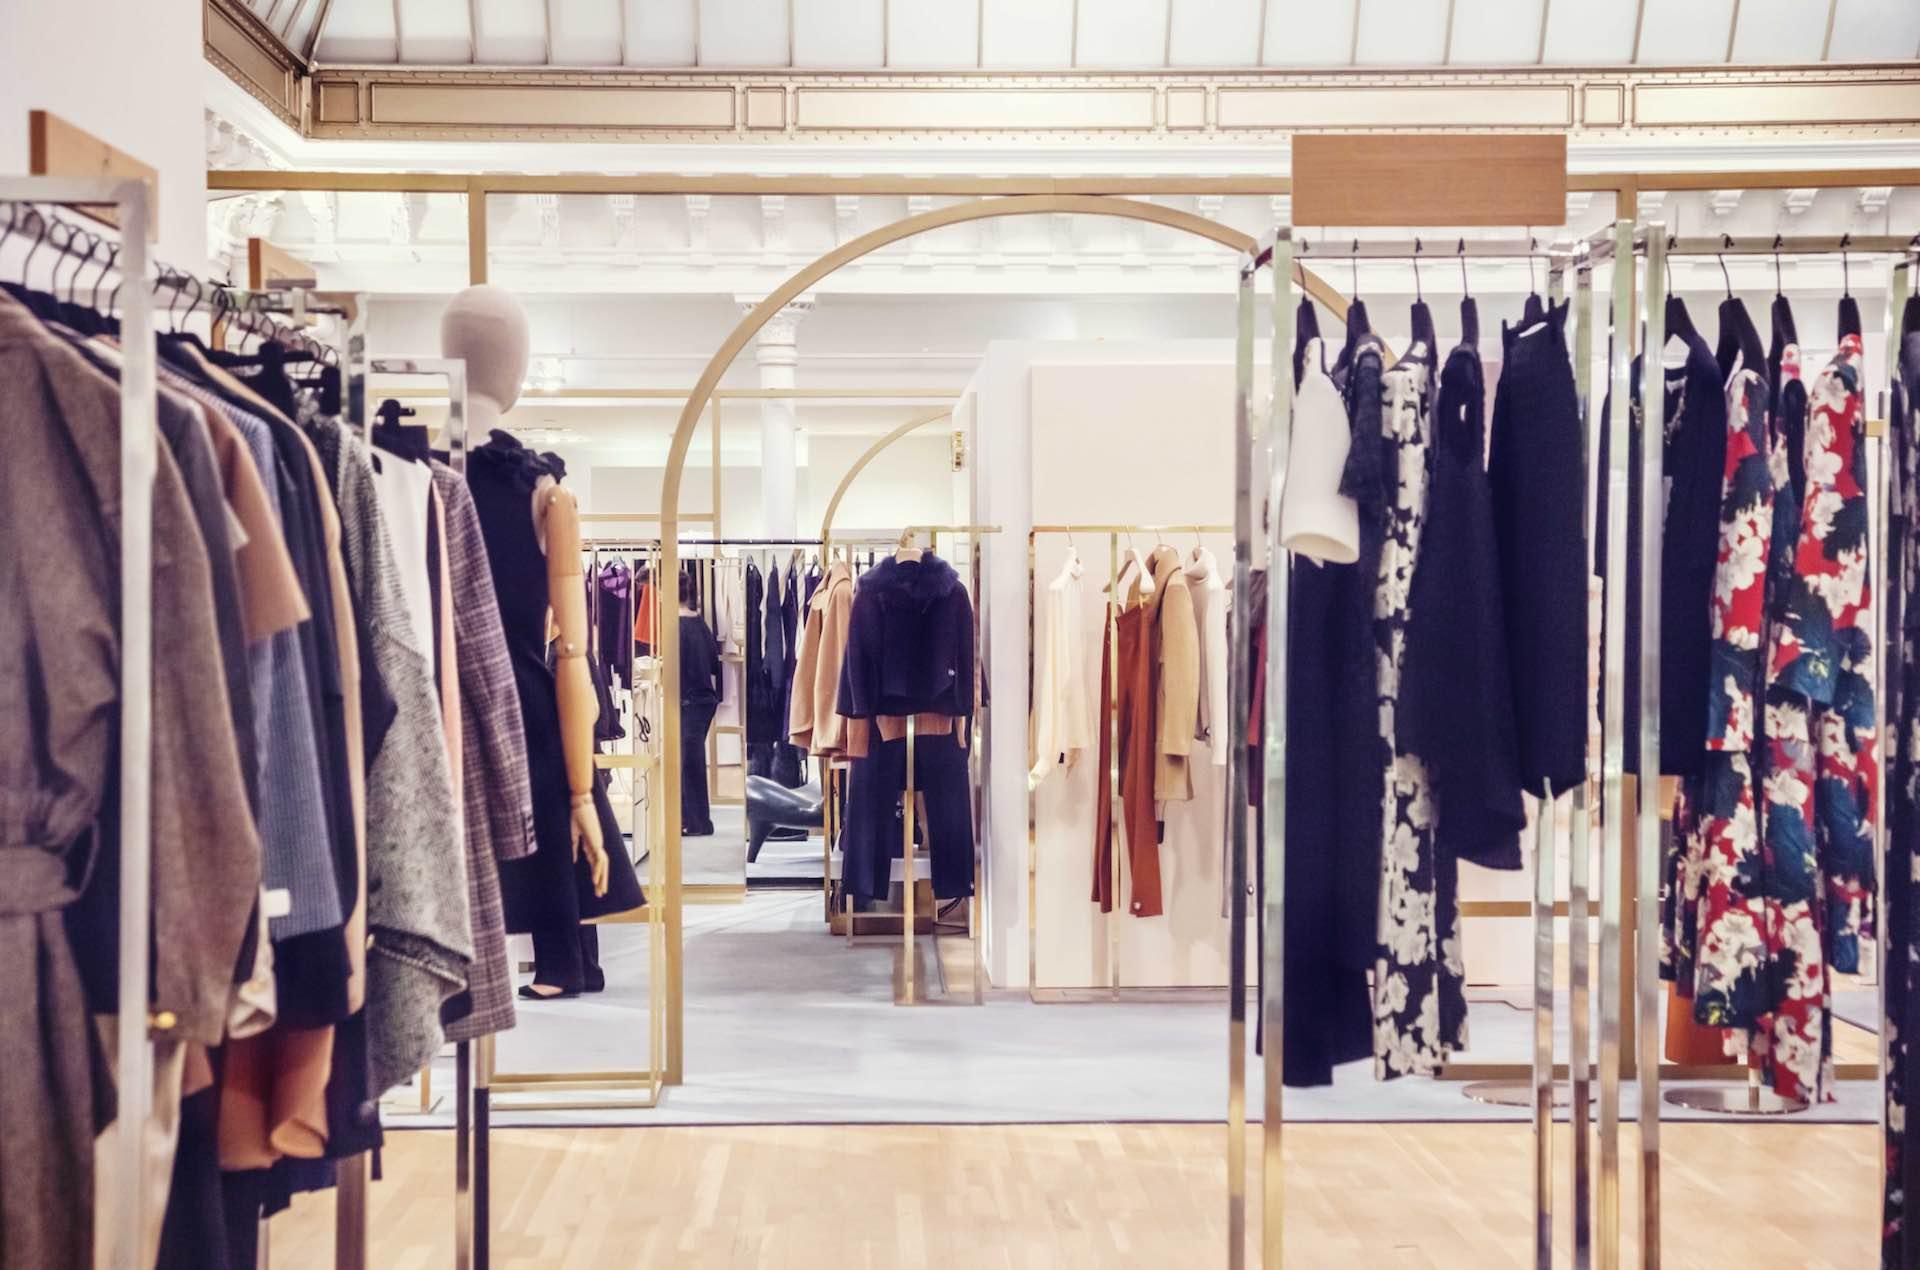 smeup soluzioni settore retail